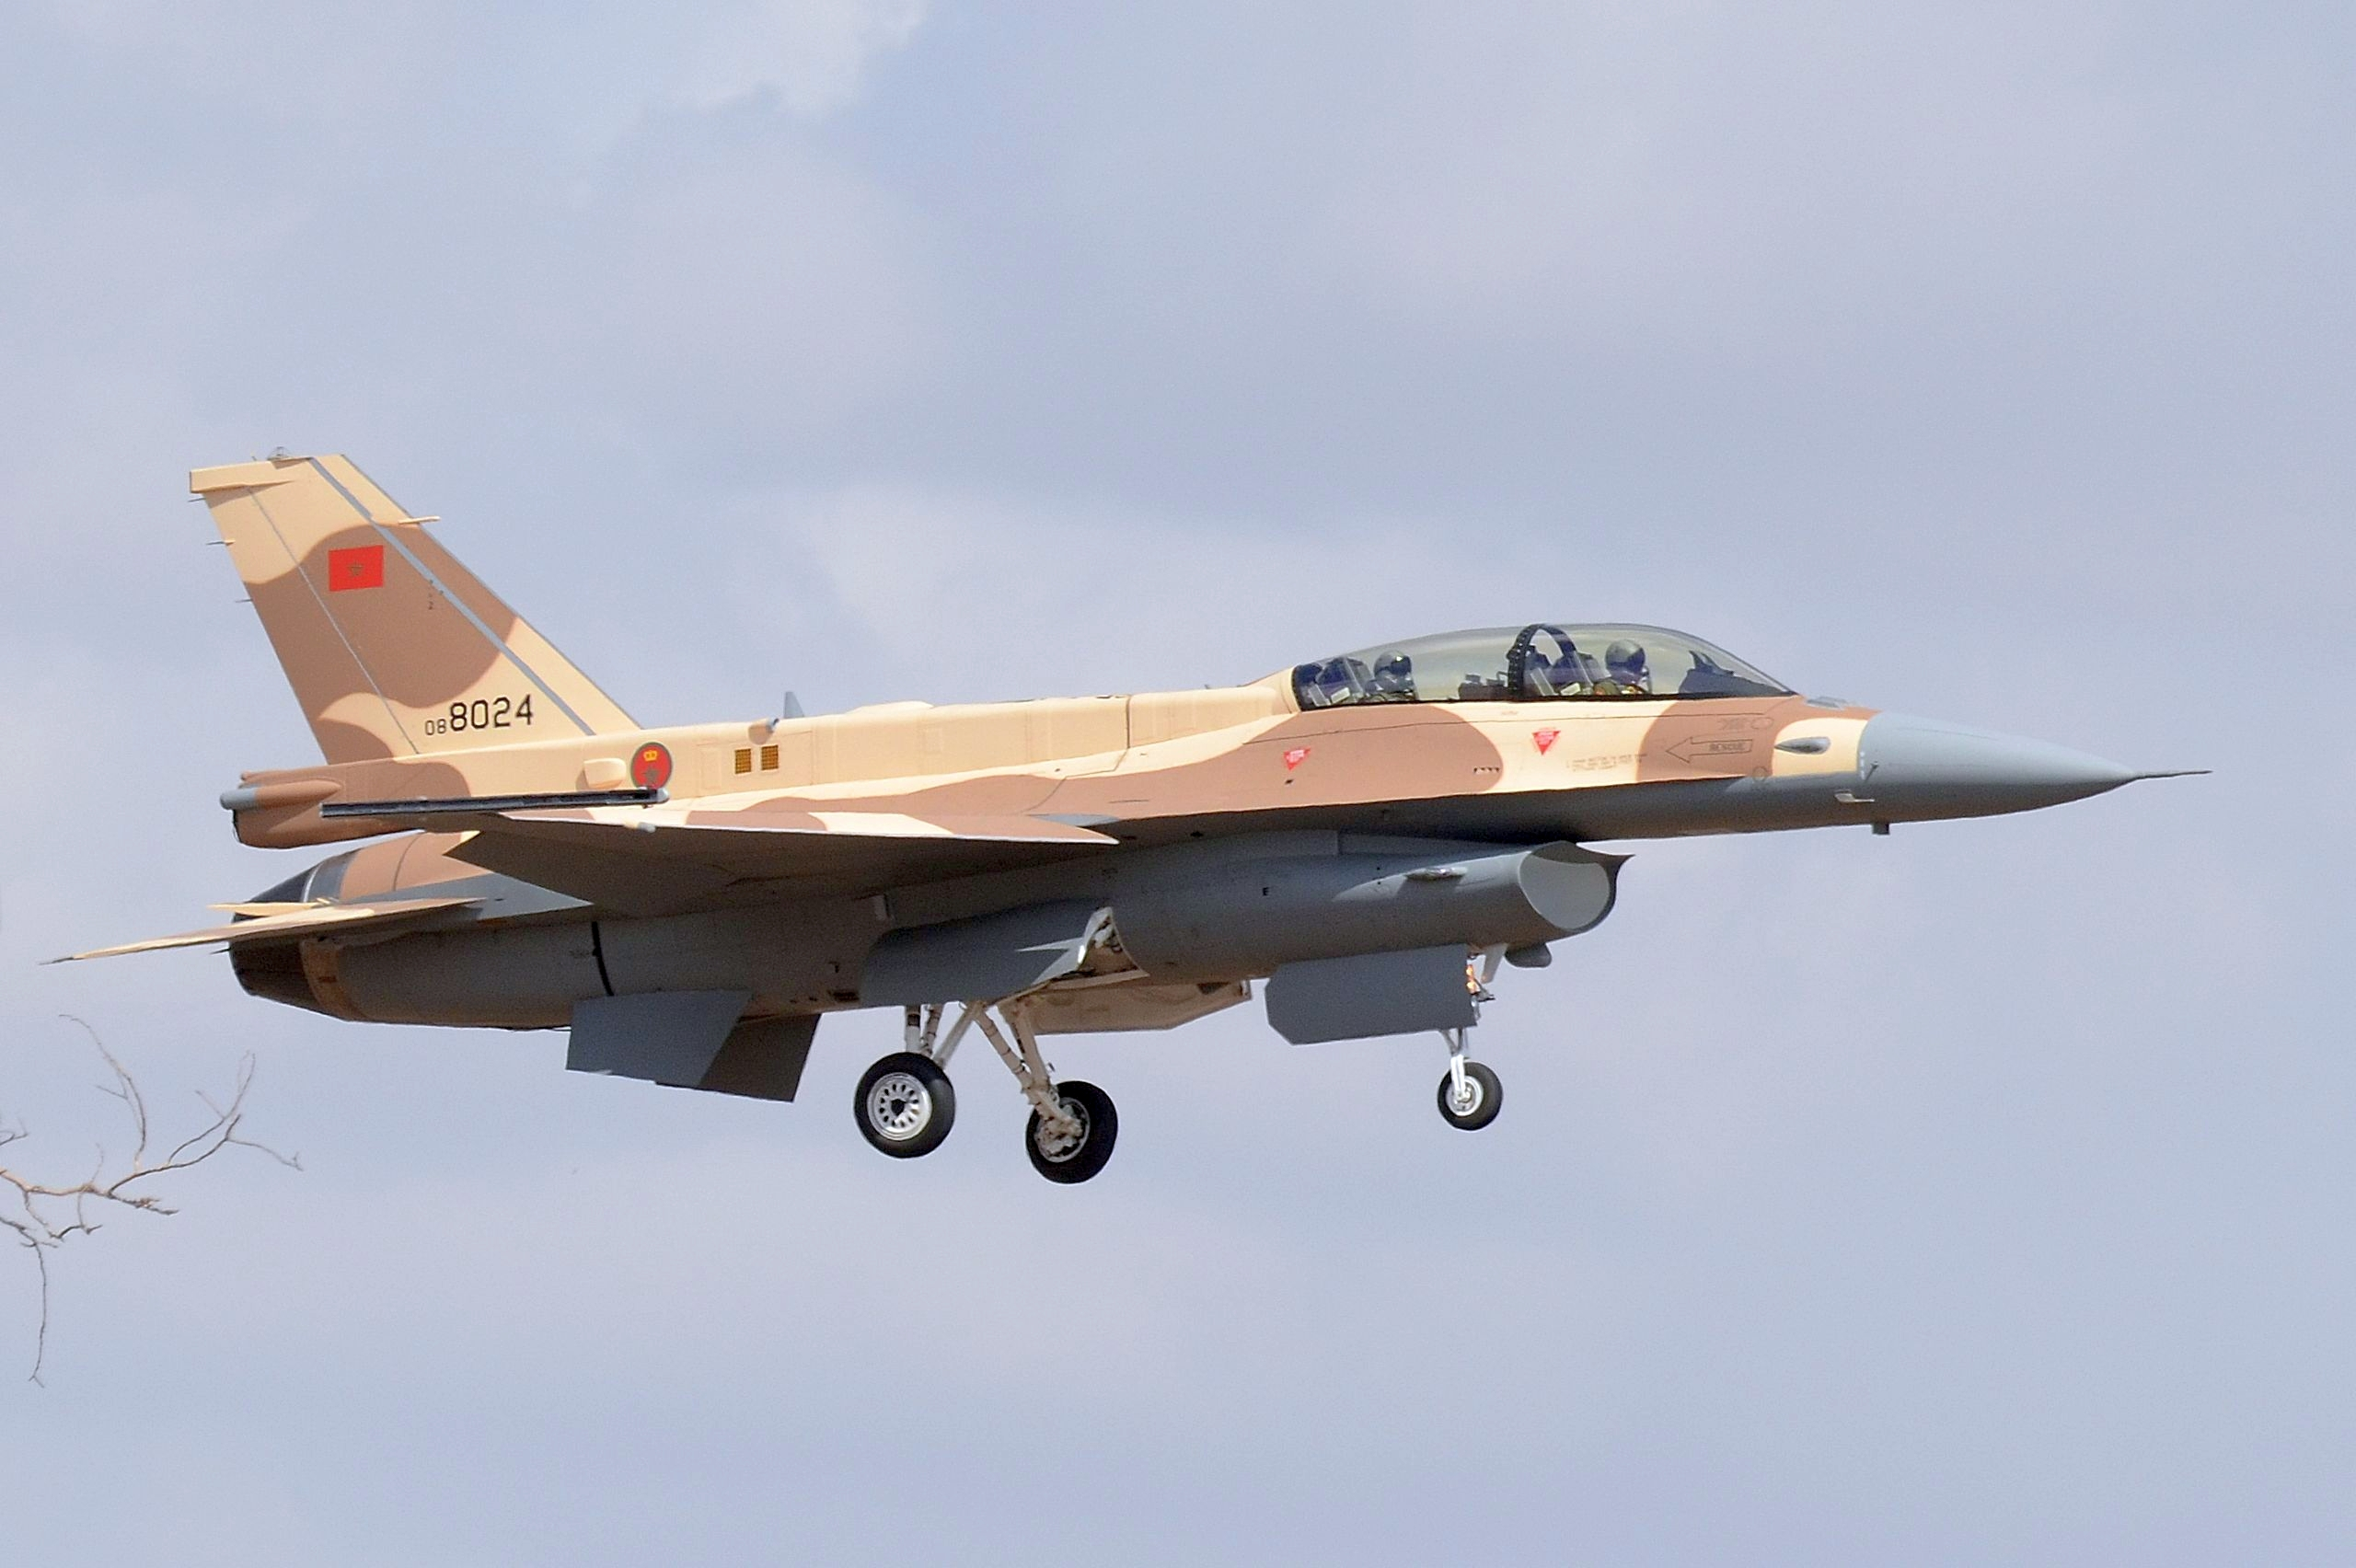 Moroccan F-16 Atlas Falcon / RMAF F16 block 52+ - Page 31 32173530400_402b4b3022_o